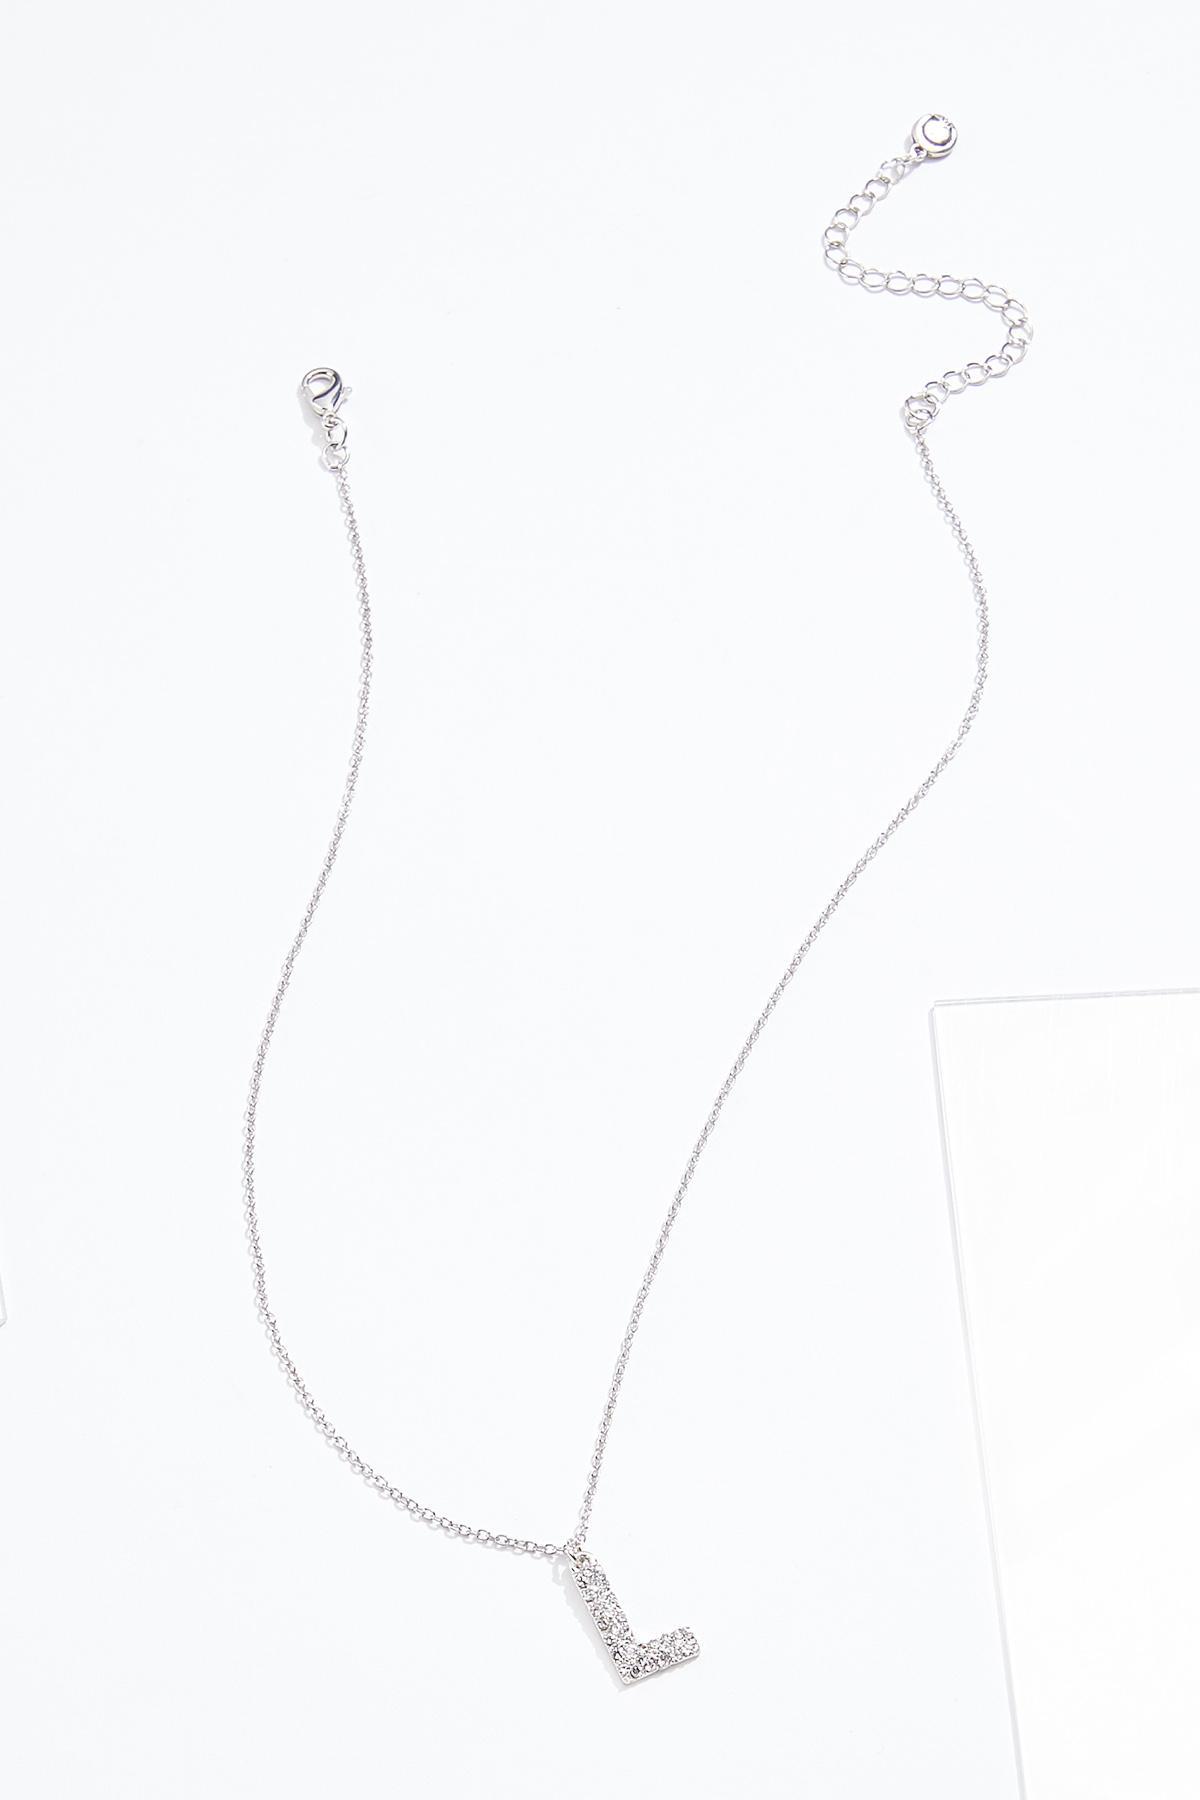 Rhinestone L Pendant Necklace